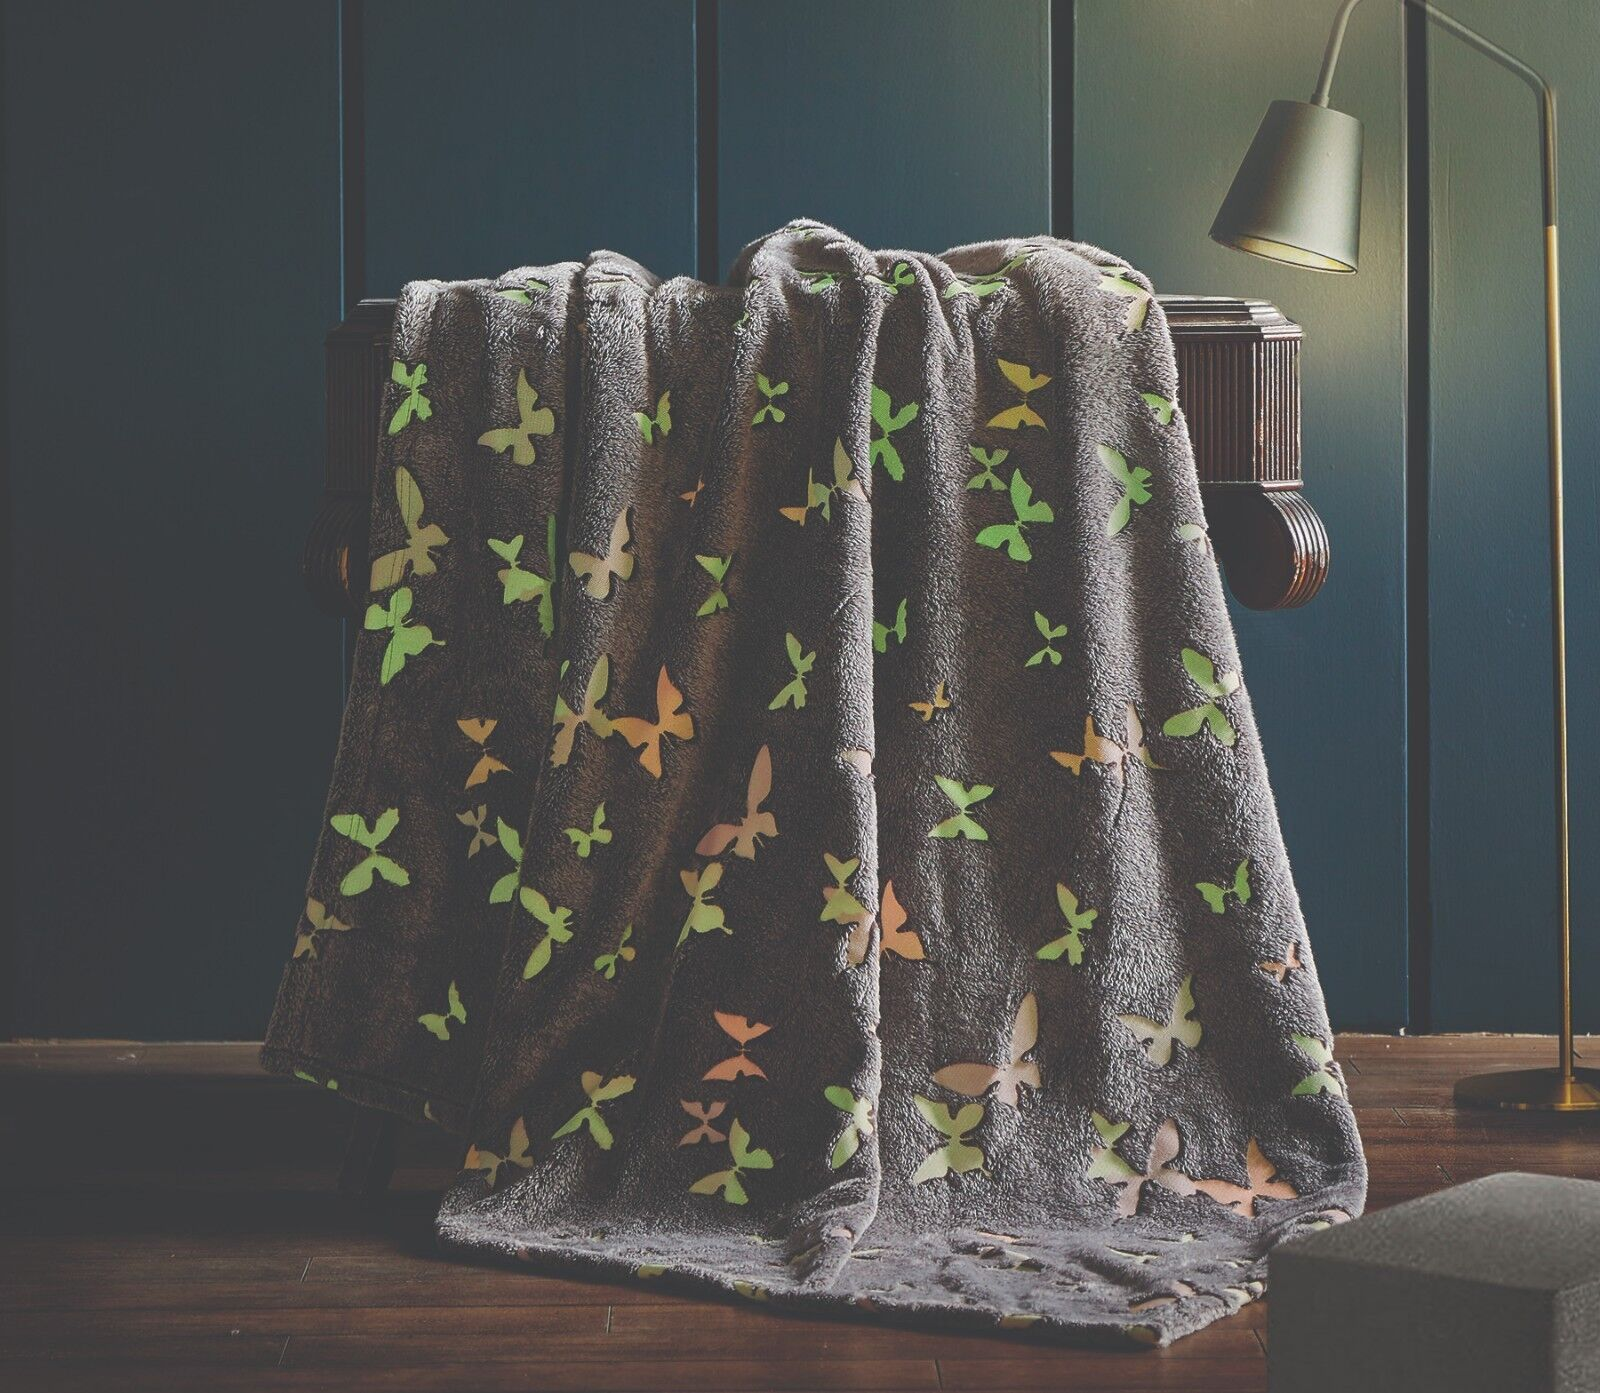 GLOW IN THE DARK LUXURY PLUSH KIDS THROW Blanket Butterflies Regal Comfort